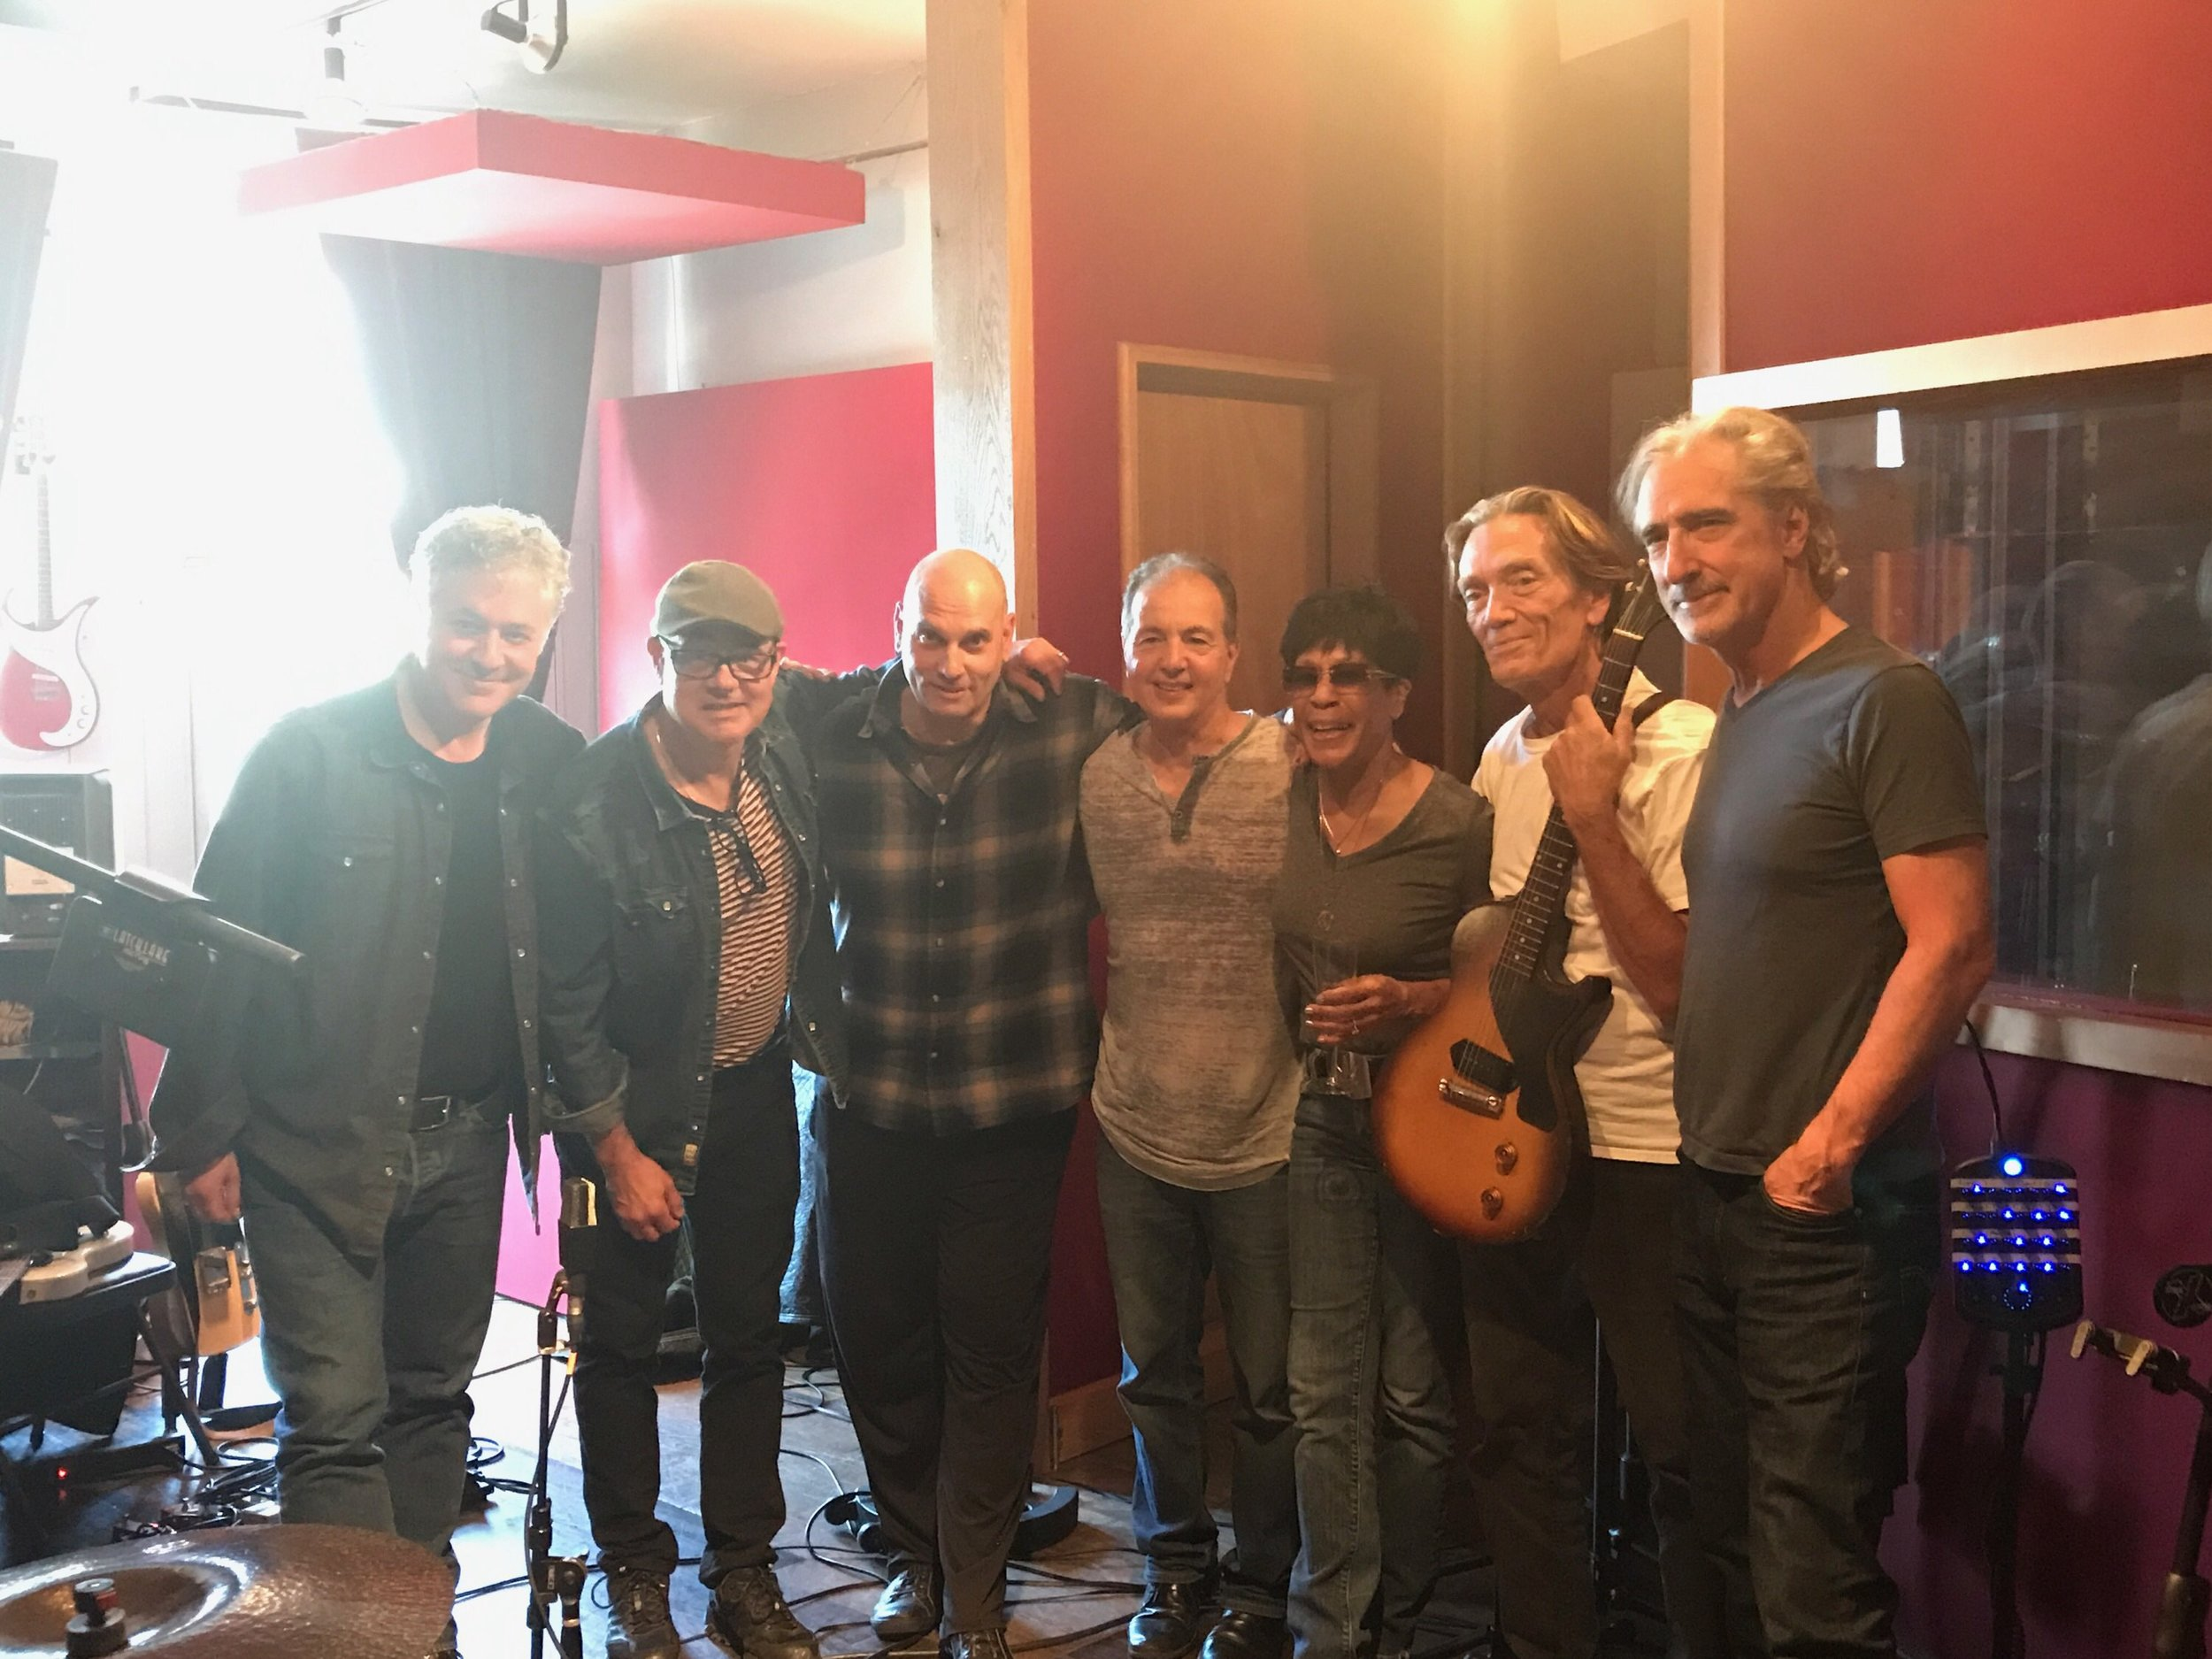 Duke Levine, Charlie Giordano, M. Giovino, Phil Butler, Bettye LaVette, G.E. Smith, John Leventhal; NYC